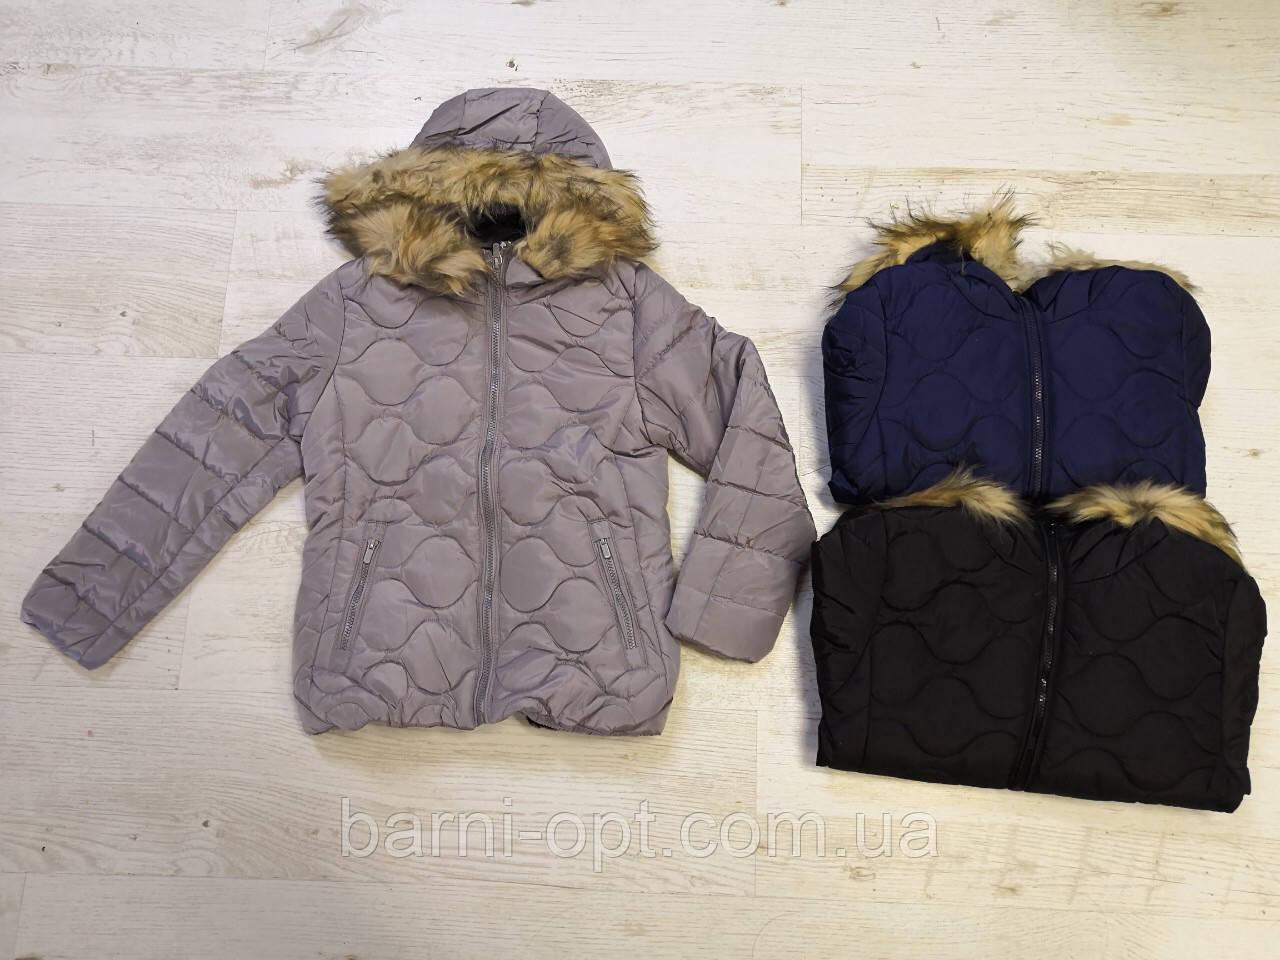 Зимняя куртка на девочку оптом, Glo-story, 134/140-170 рр